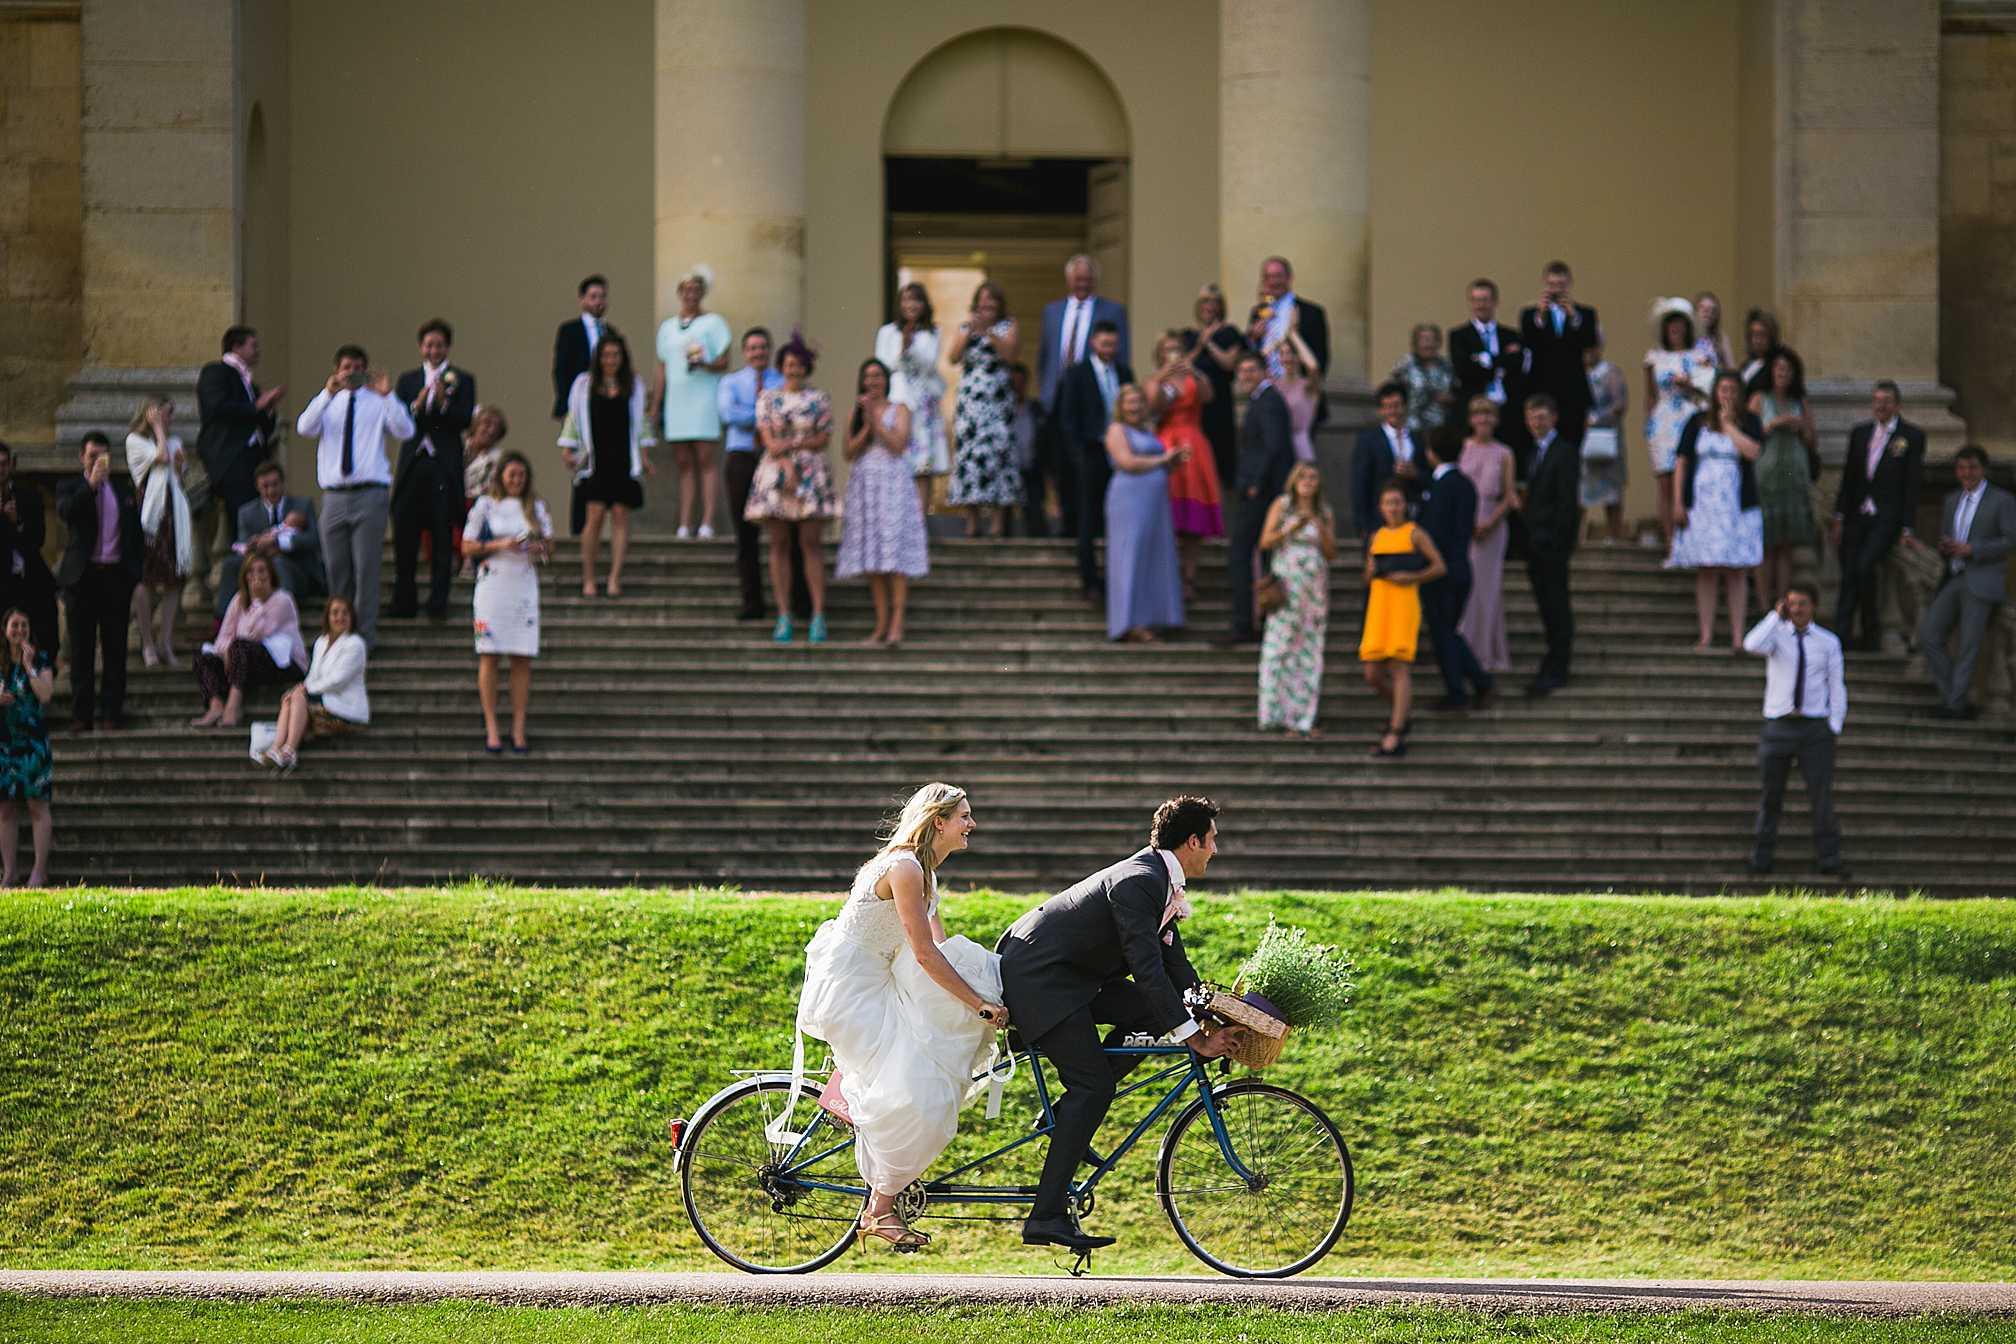 Northamptonshire Documentary Wedding Photographer